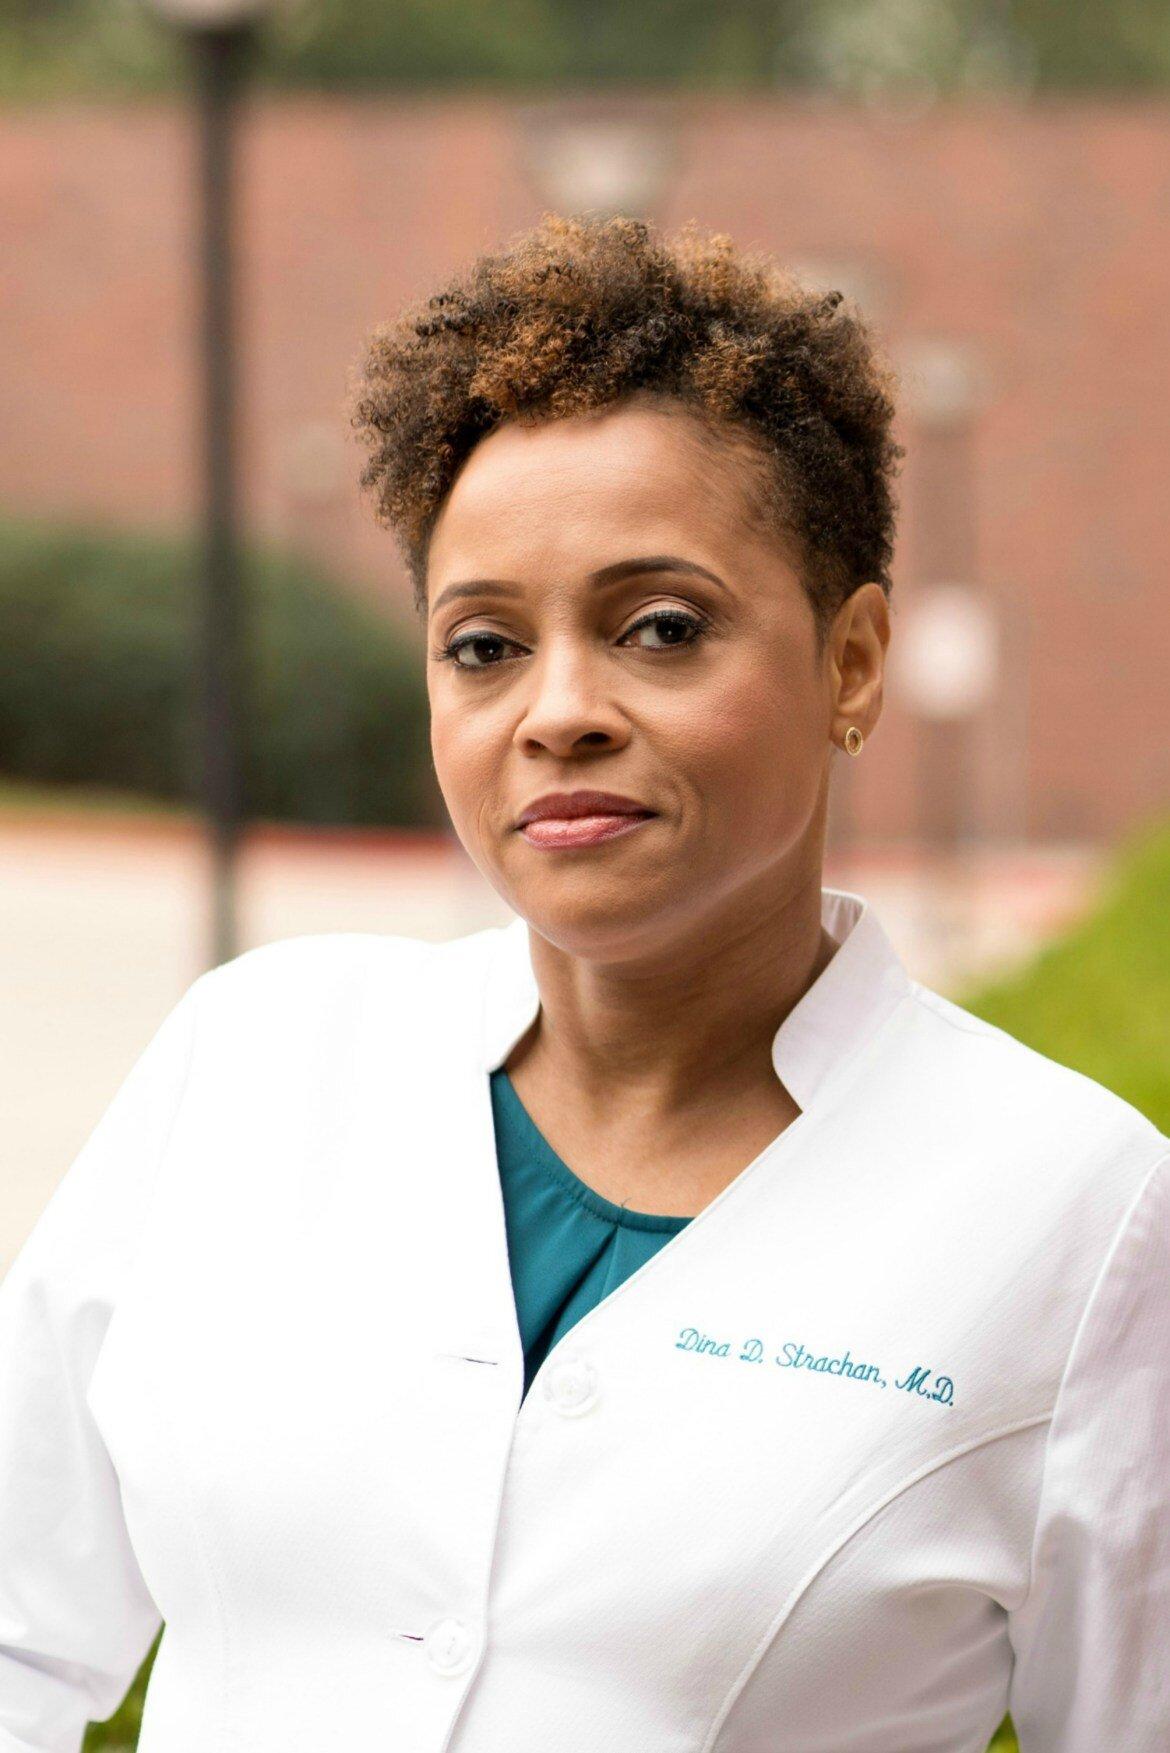 Dr. Dina Strachan, MD